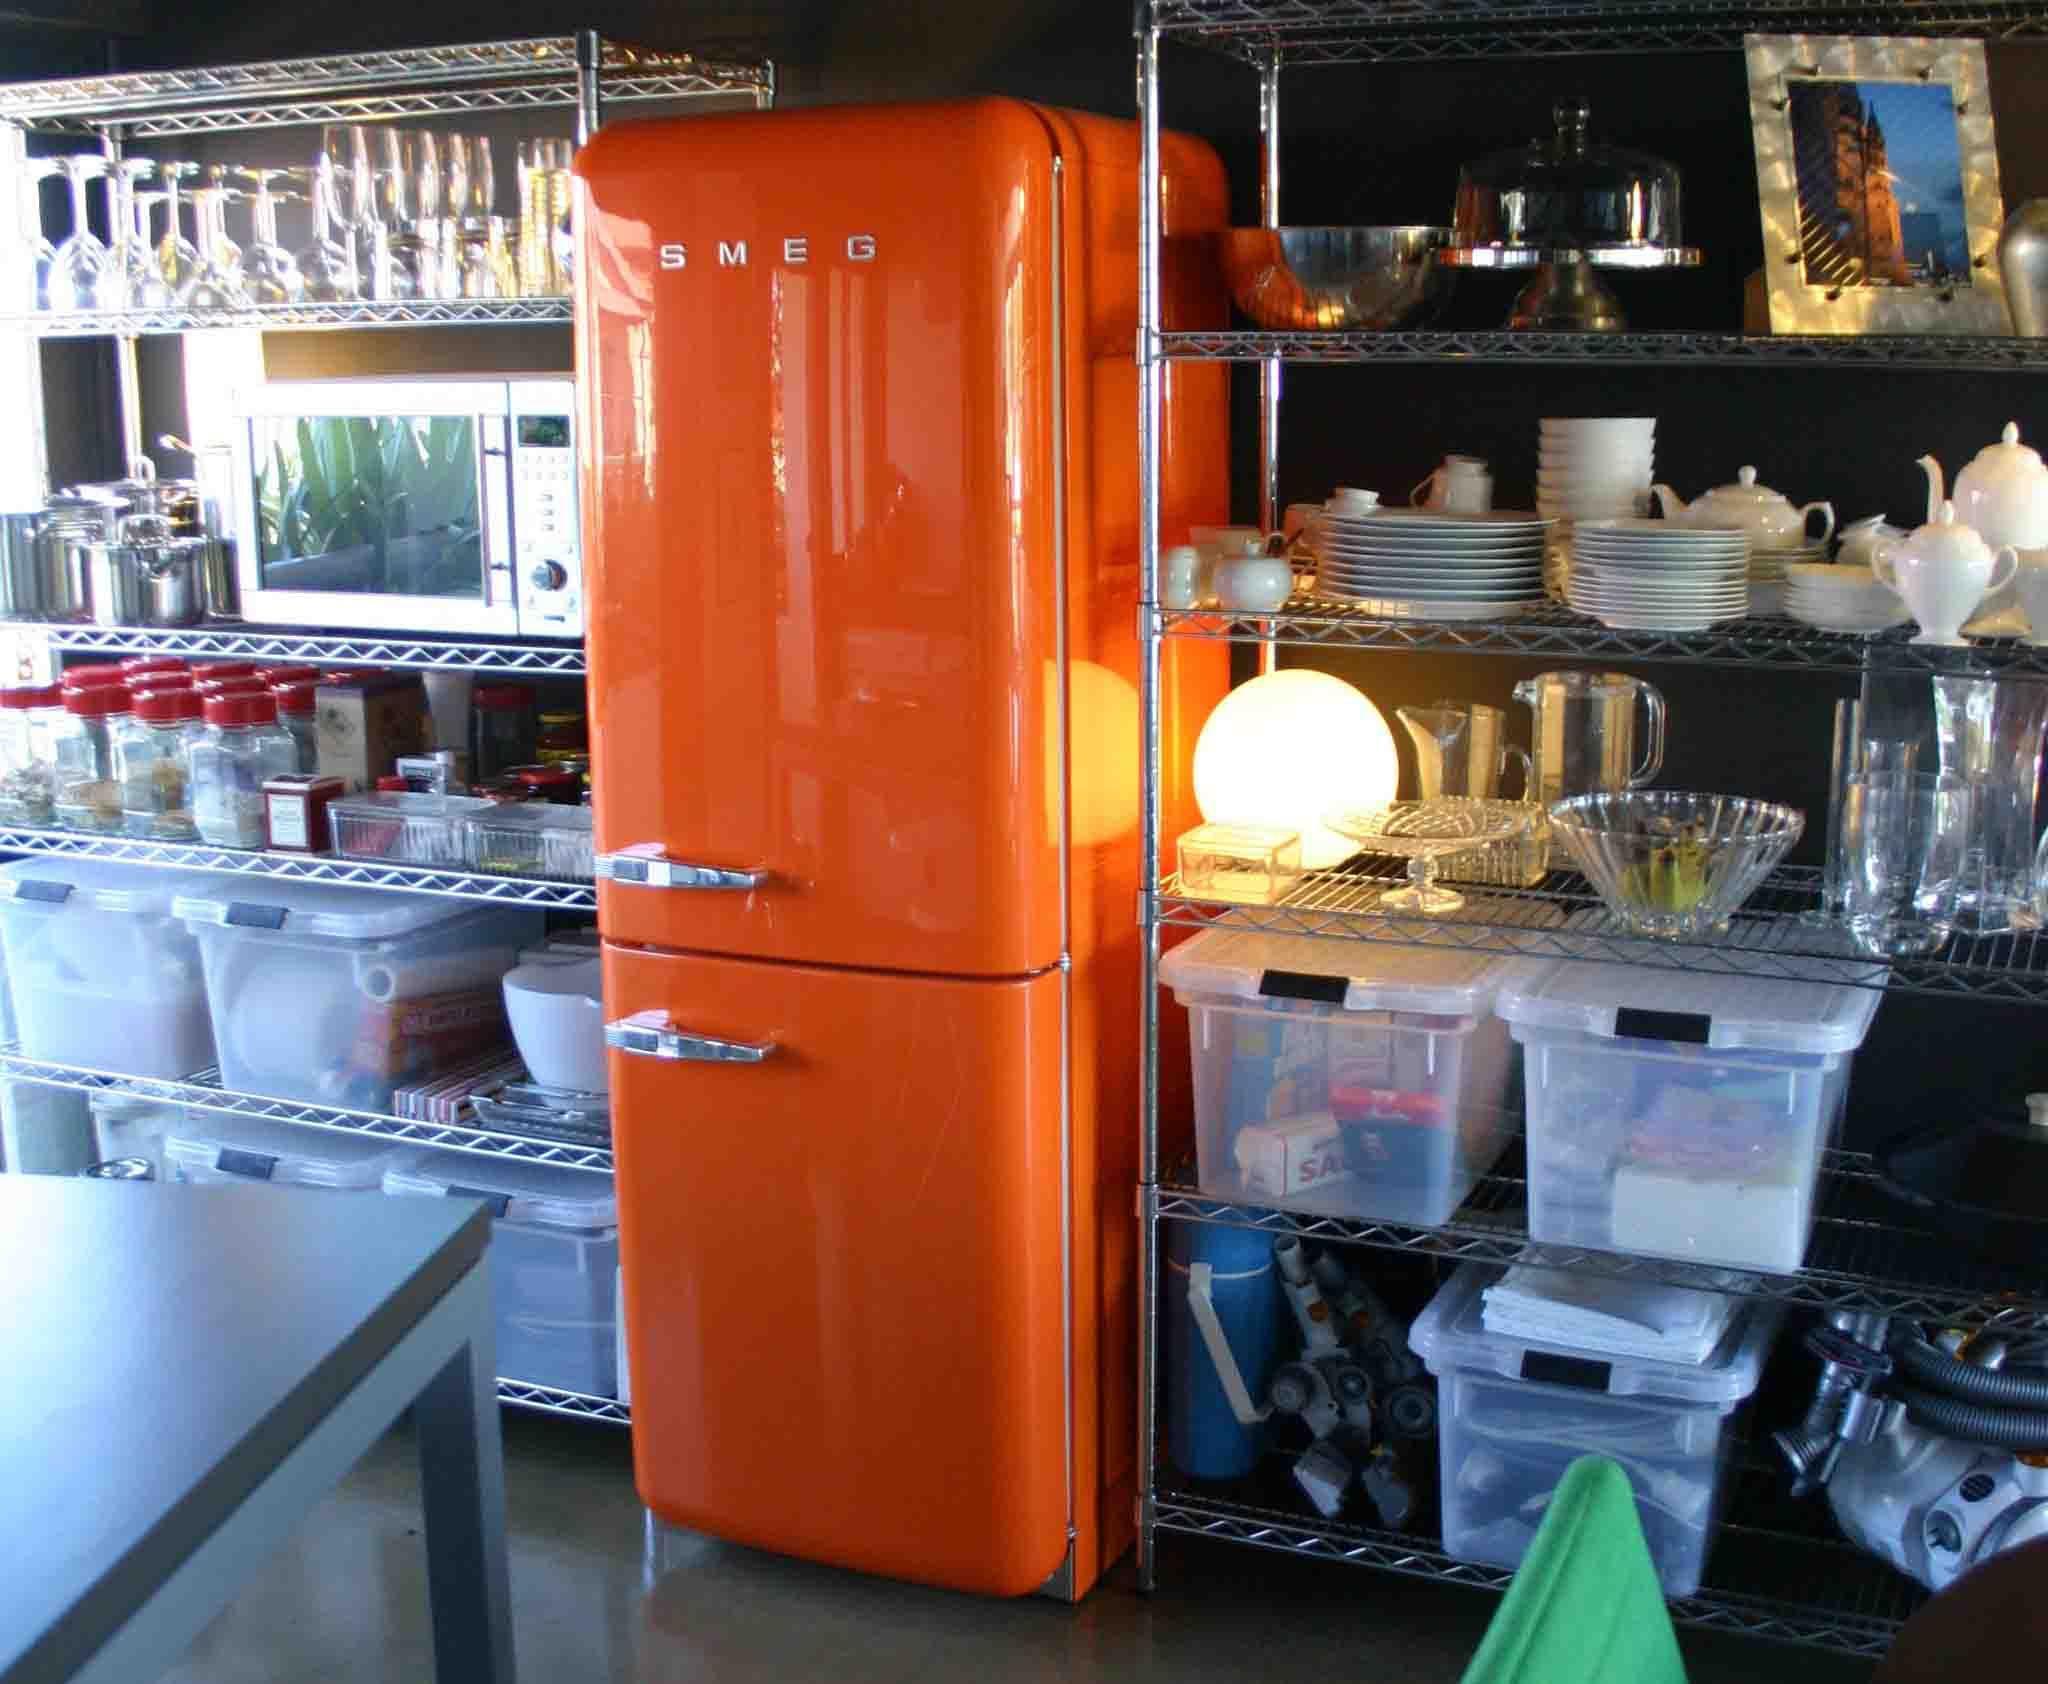 Industrial Kitchen Small Apartment Kitchen Smeg Fridge Smeg Refrigerator